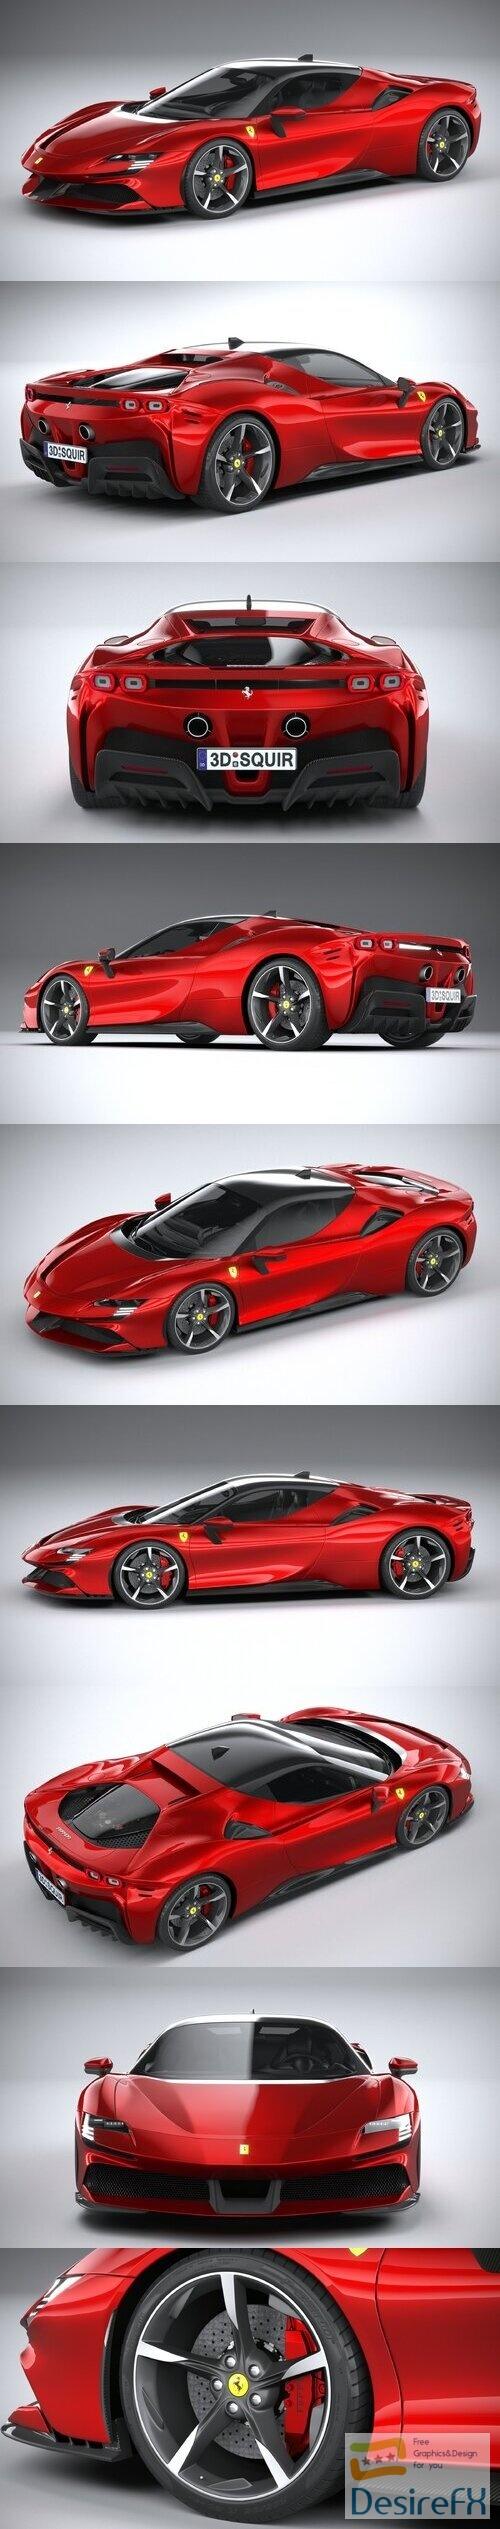 Ferrari SF90 Stradale 2021 3D Model